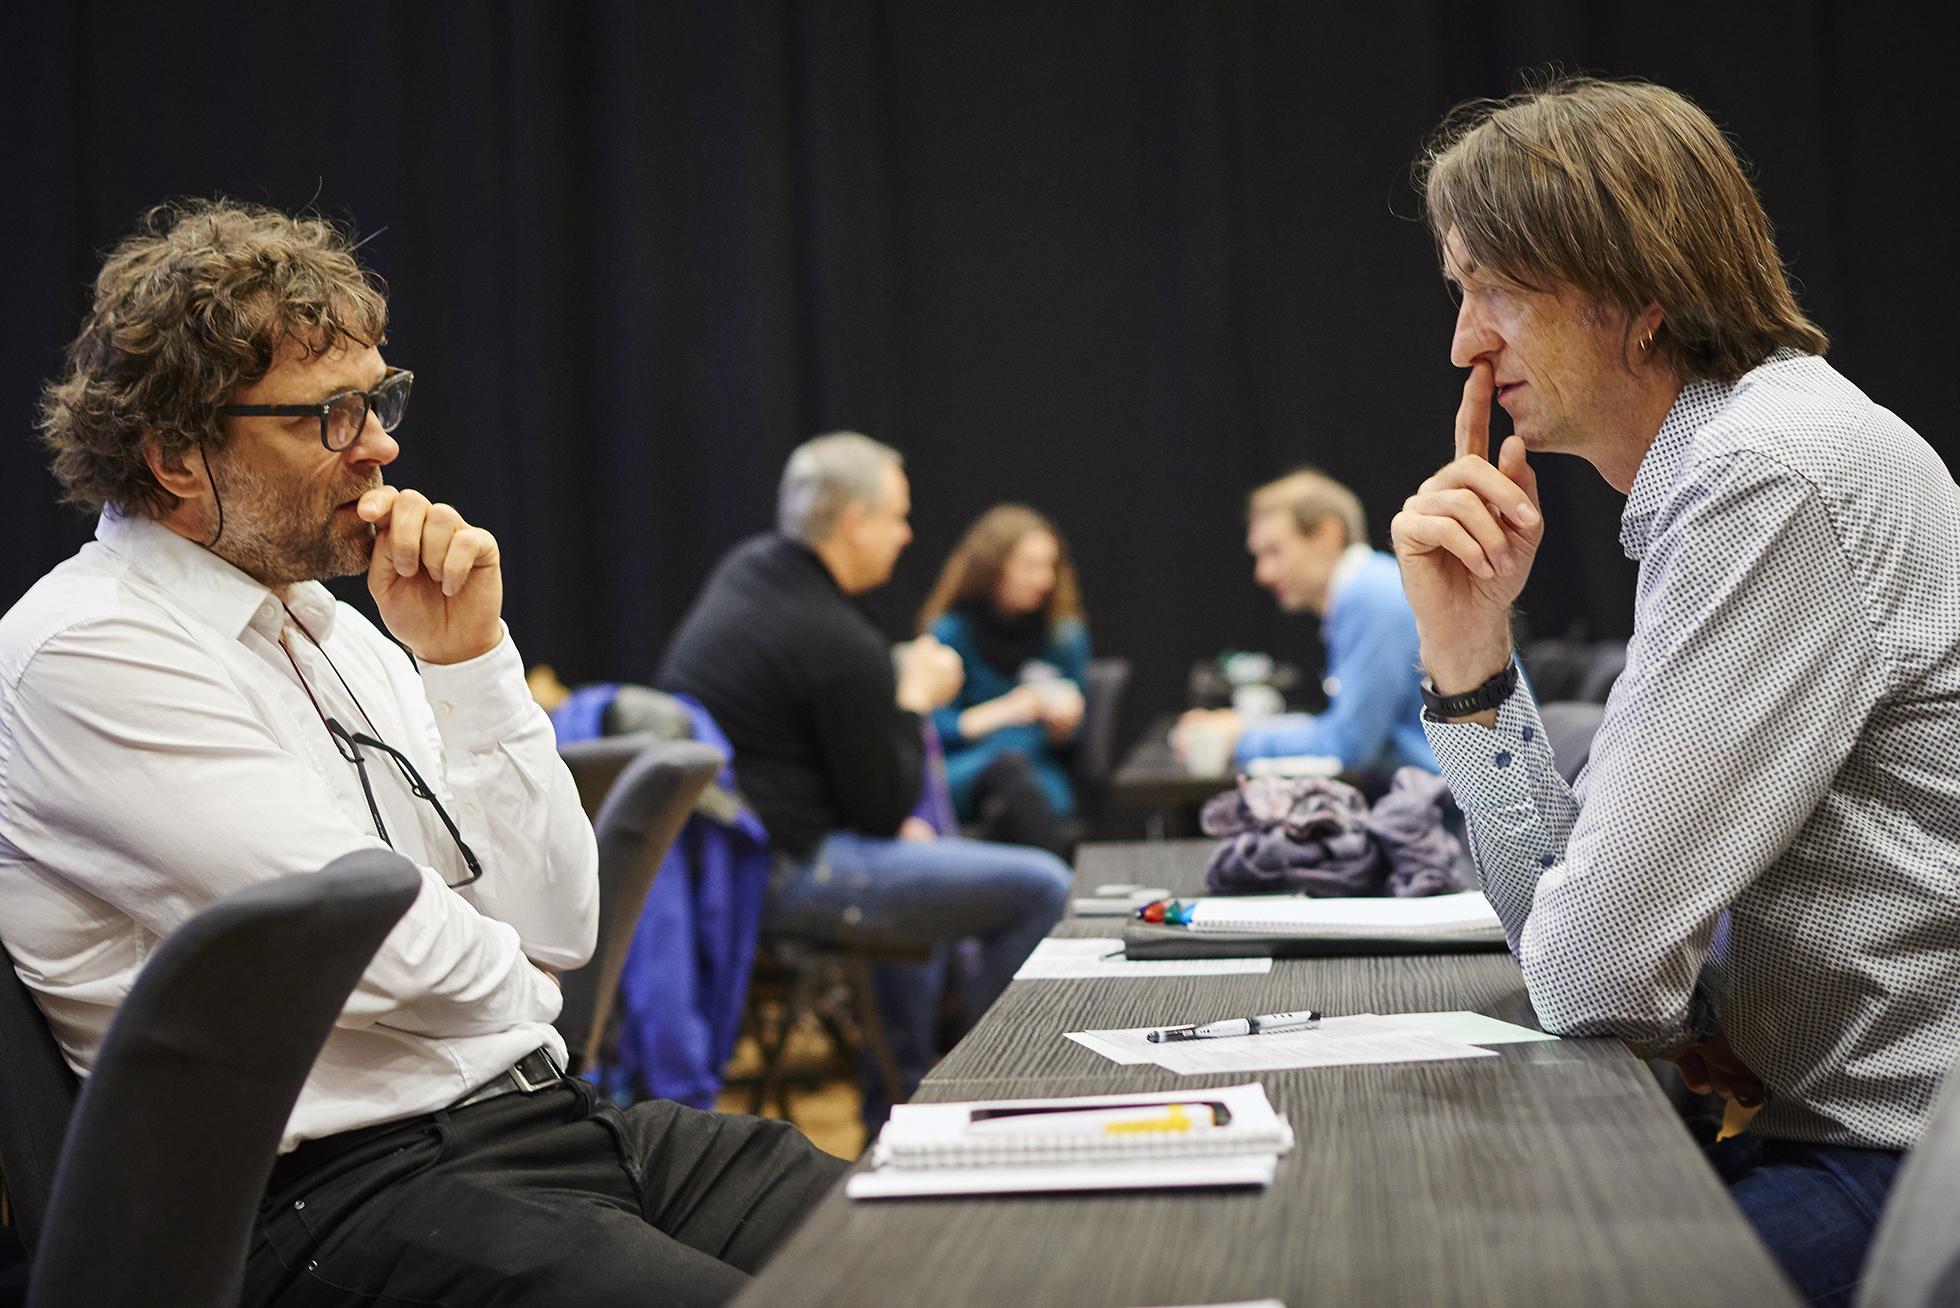 Foto: Jacob Storgaard Jensen, Storgaarddesign